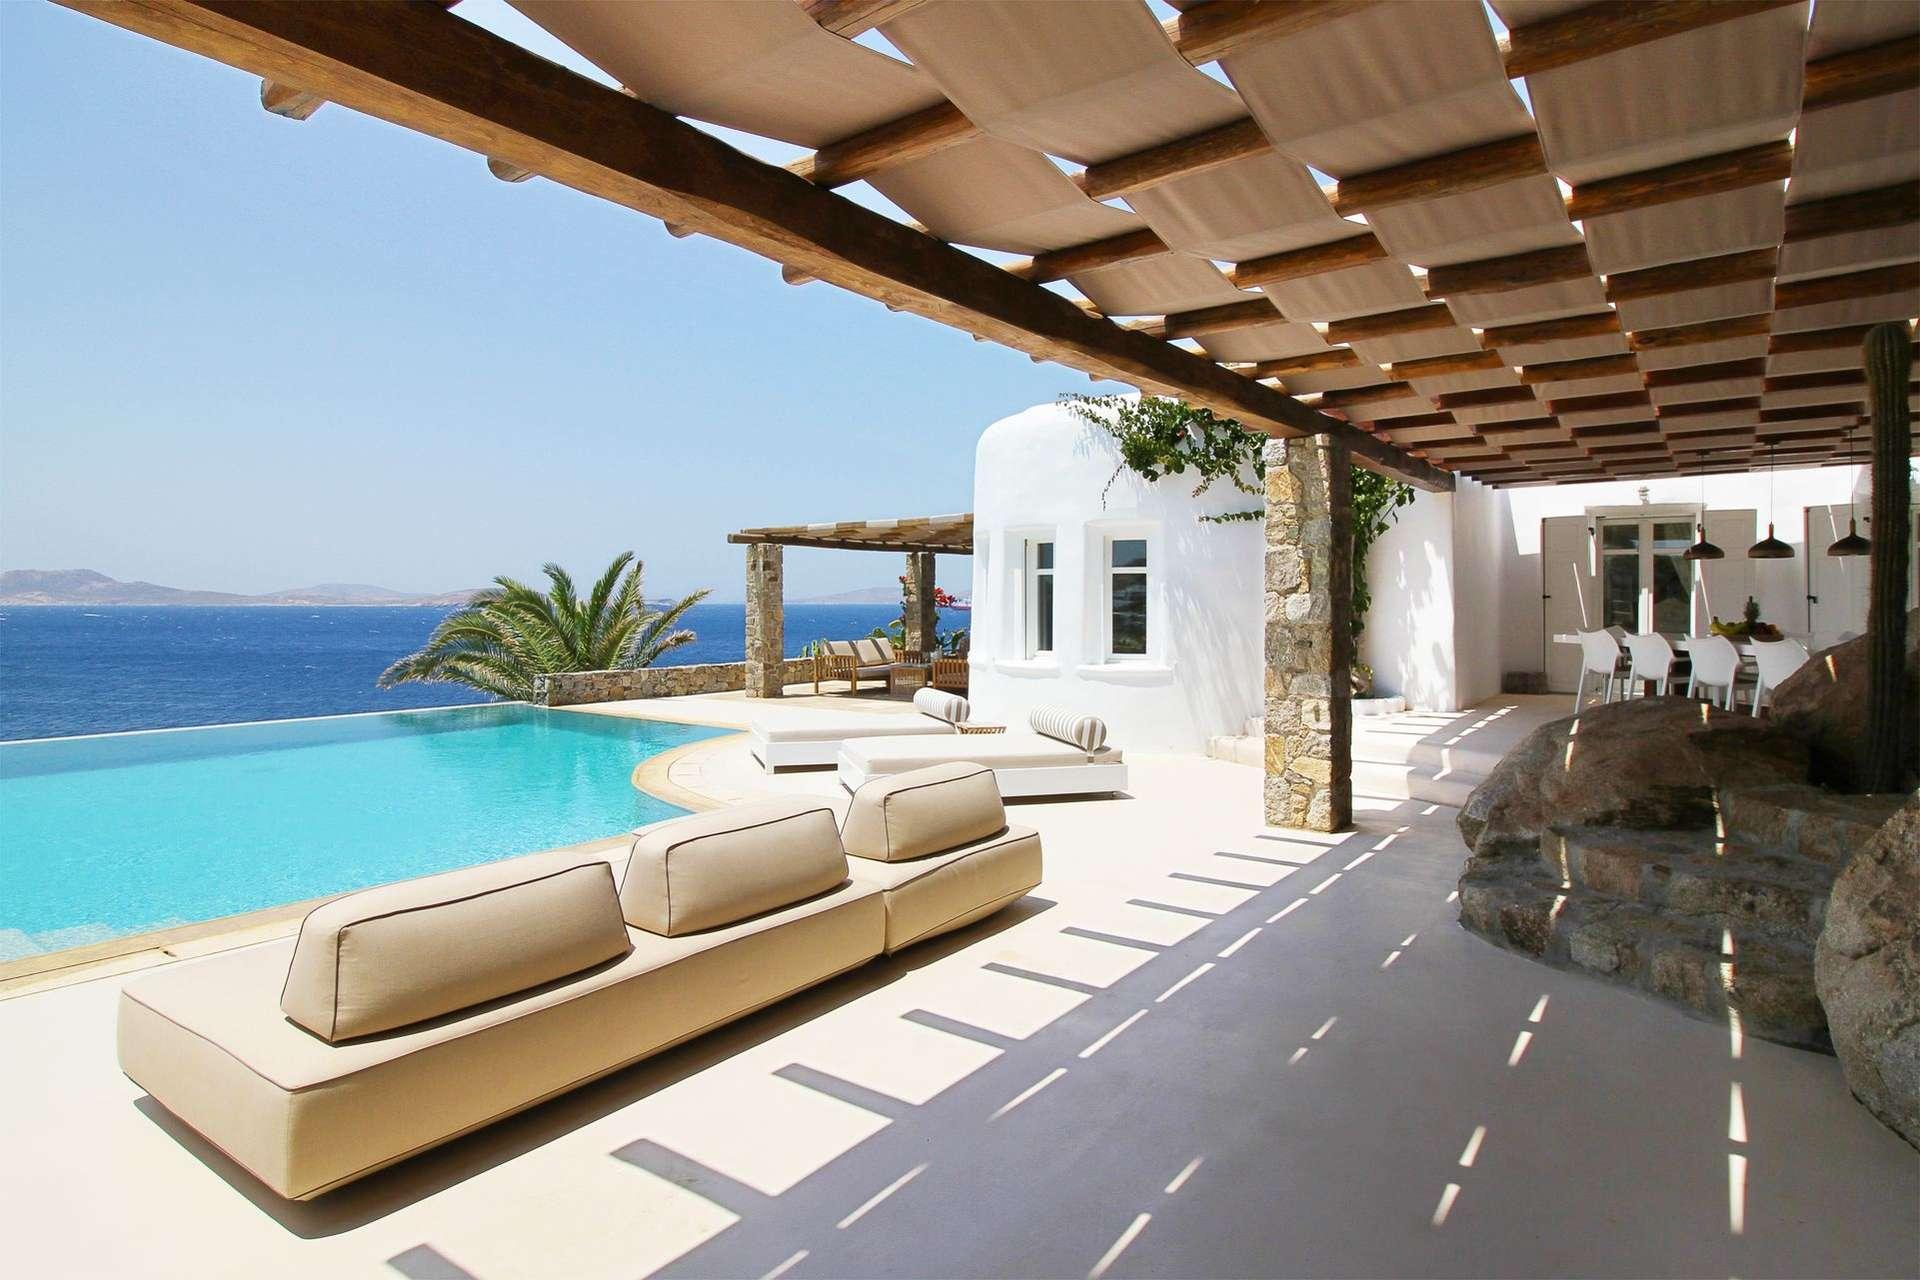 Luxury vacation rentals europe - Greece - Mykonos - Agios ioannis - Kymothoe - Image 1/17